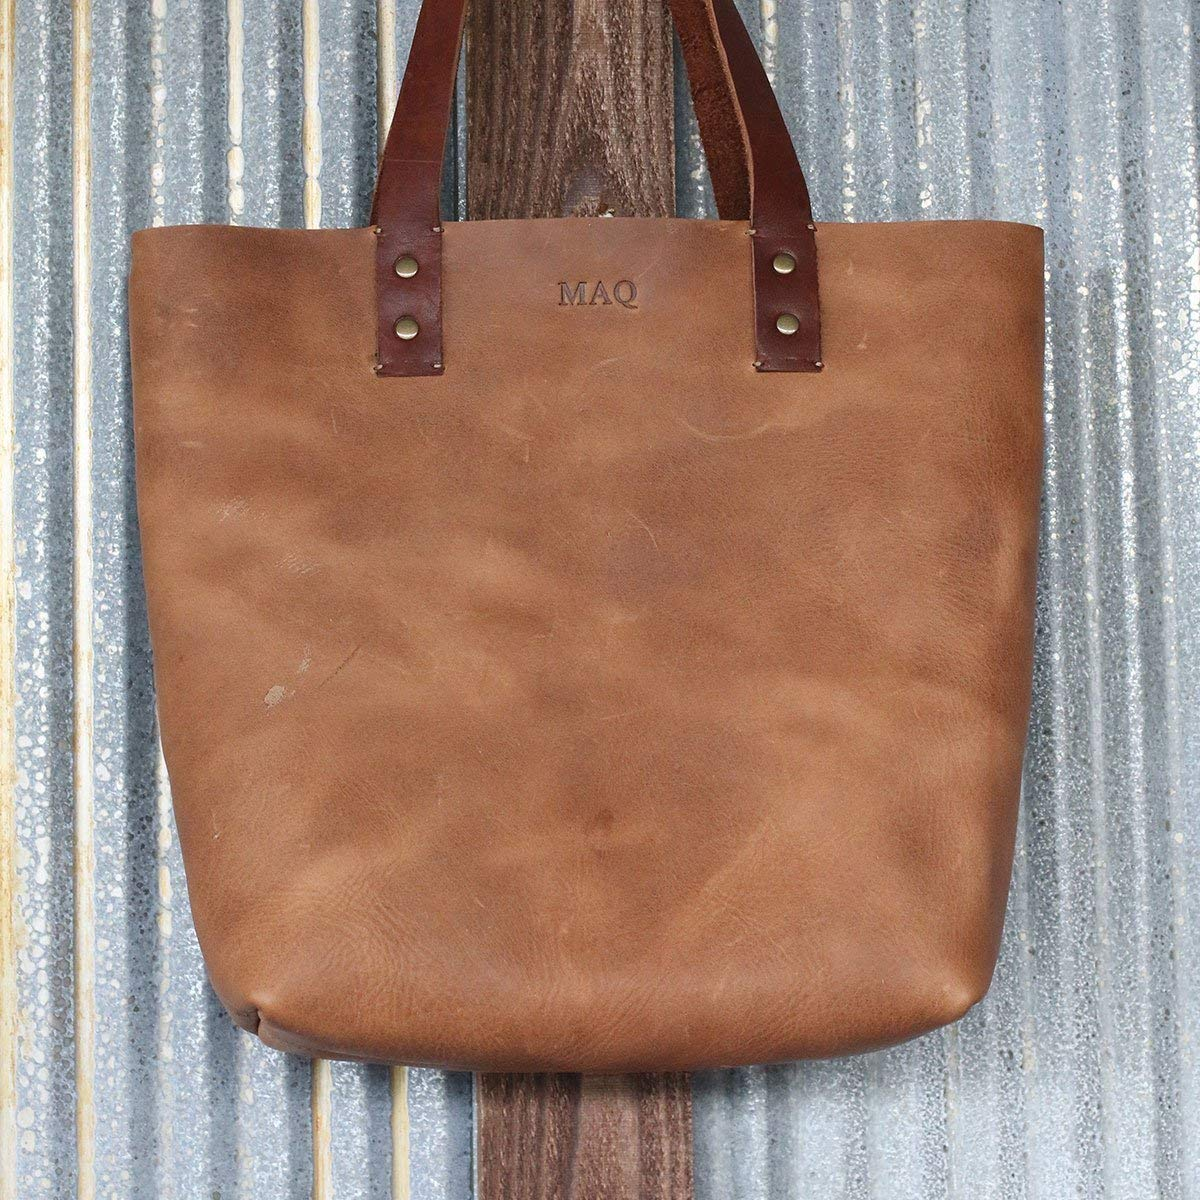 Handmade Tote Fine Leather Handbag Purse Bag The Ashley in Tan